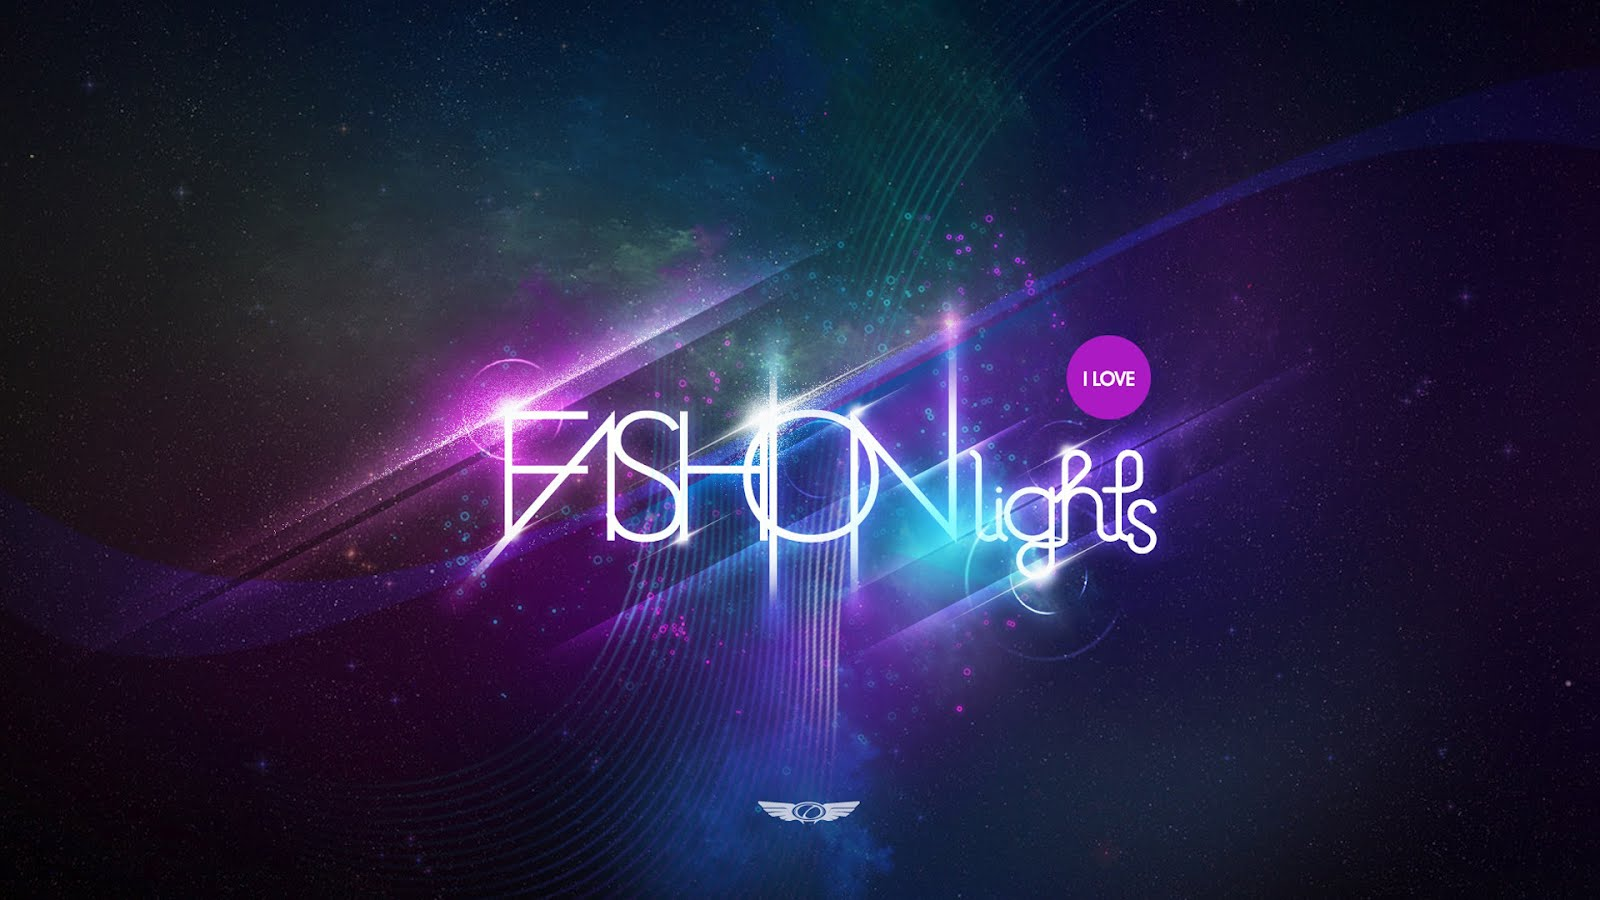 WebsiteTemplatesbz blog Beautiful Fashion Wallpapers 1600x900